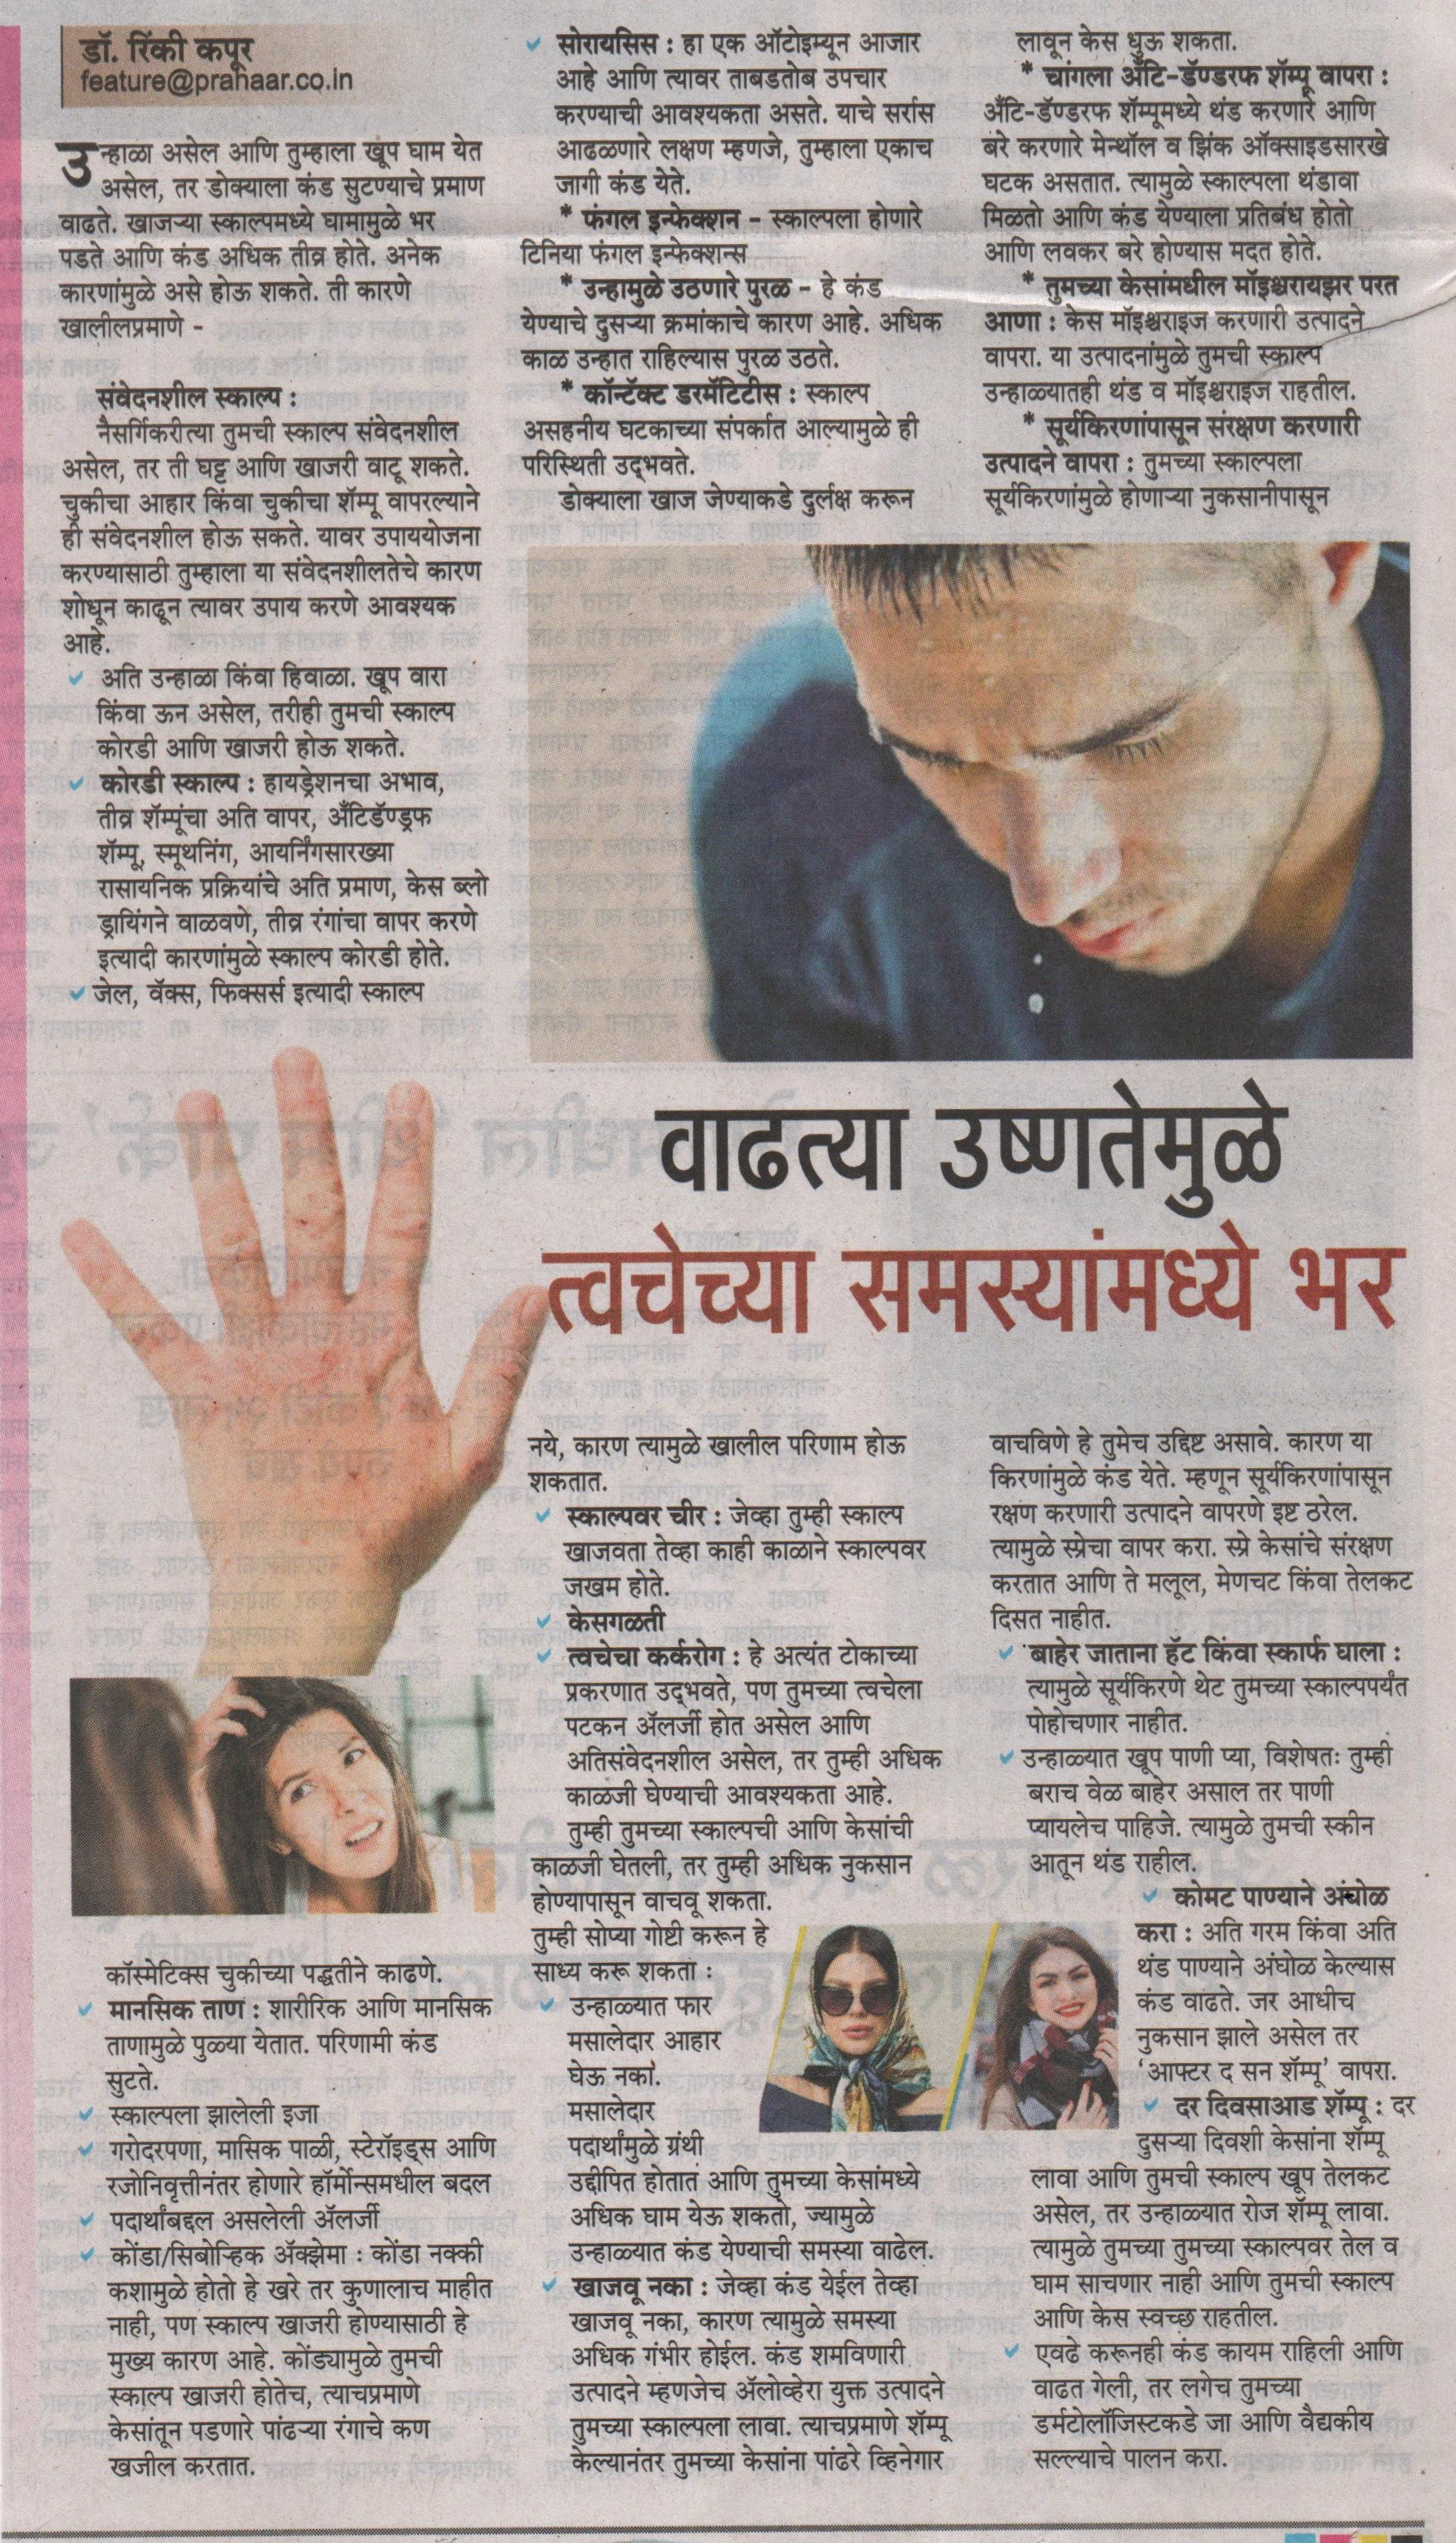 Increasing Heat Causes Stress On Skin Problems - Prahar